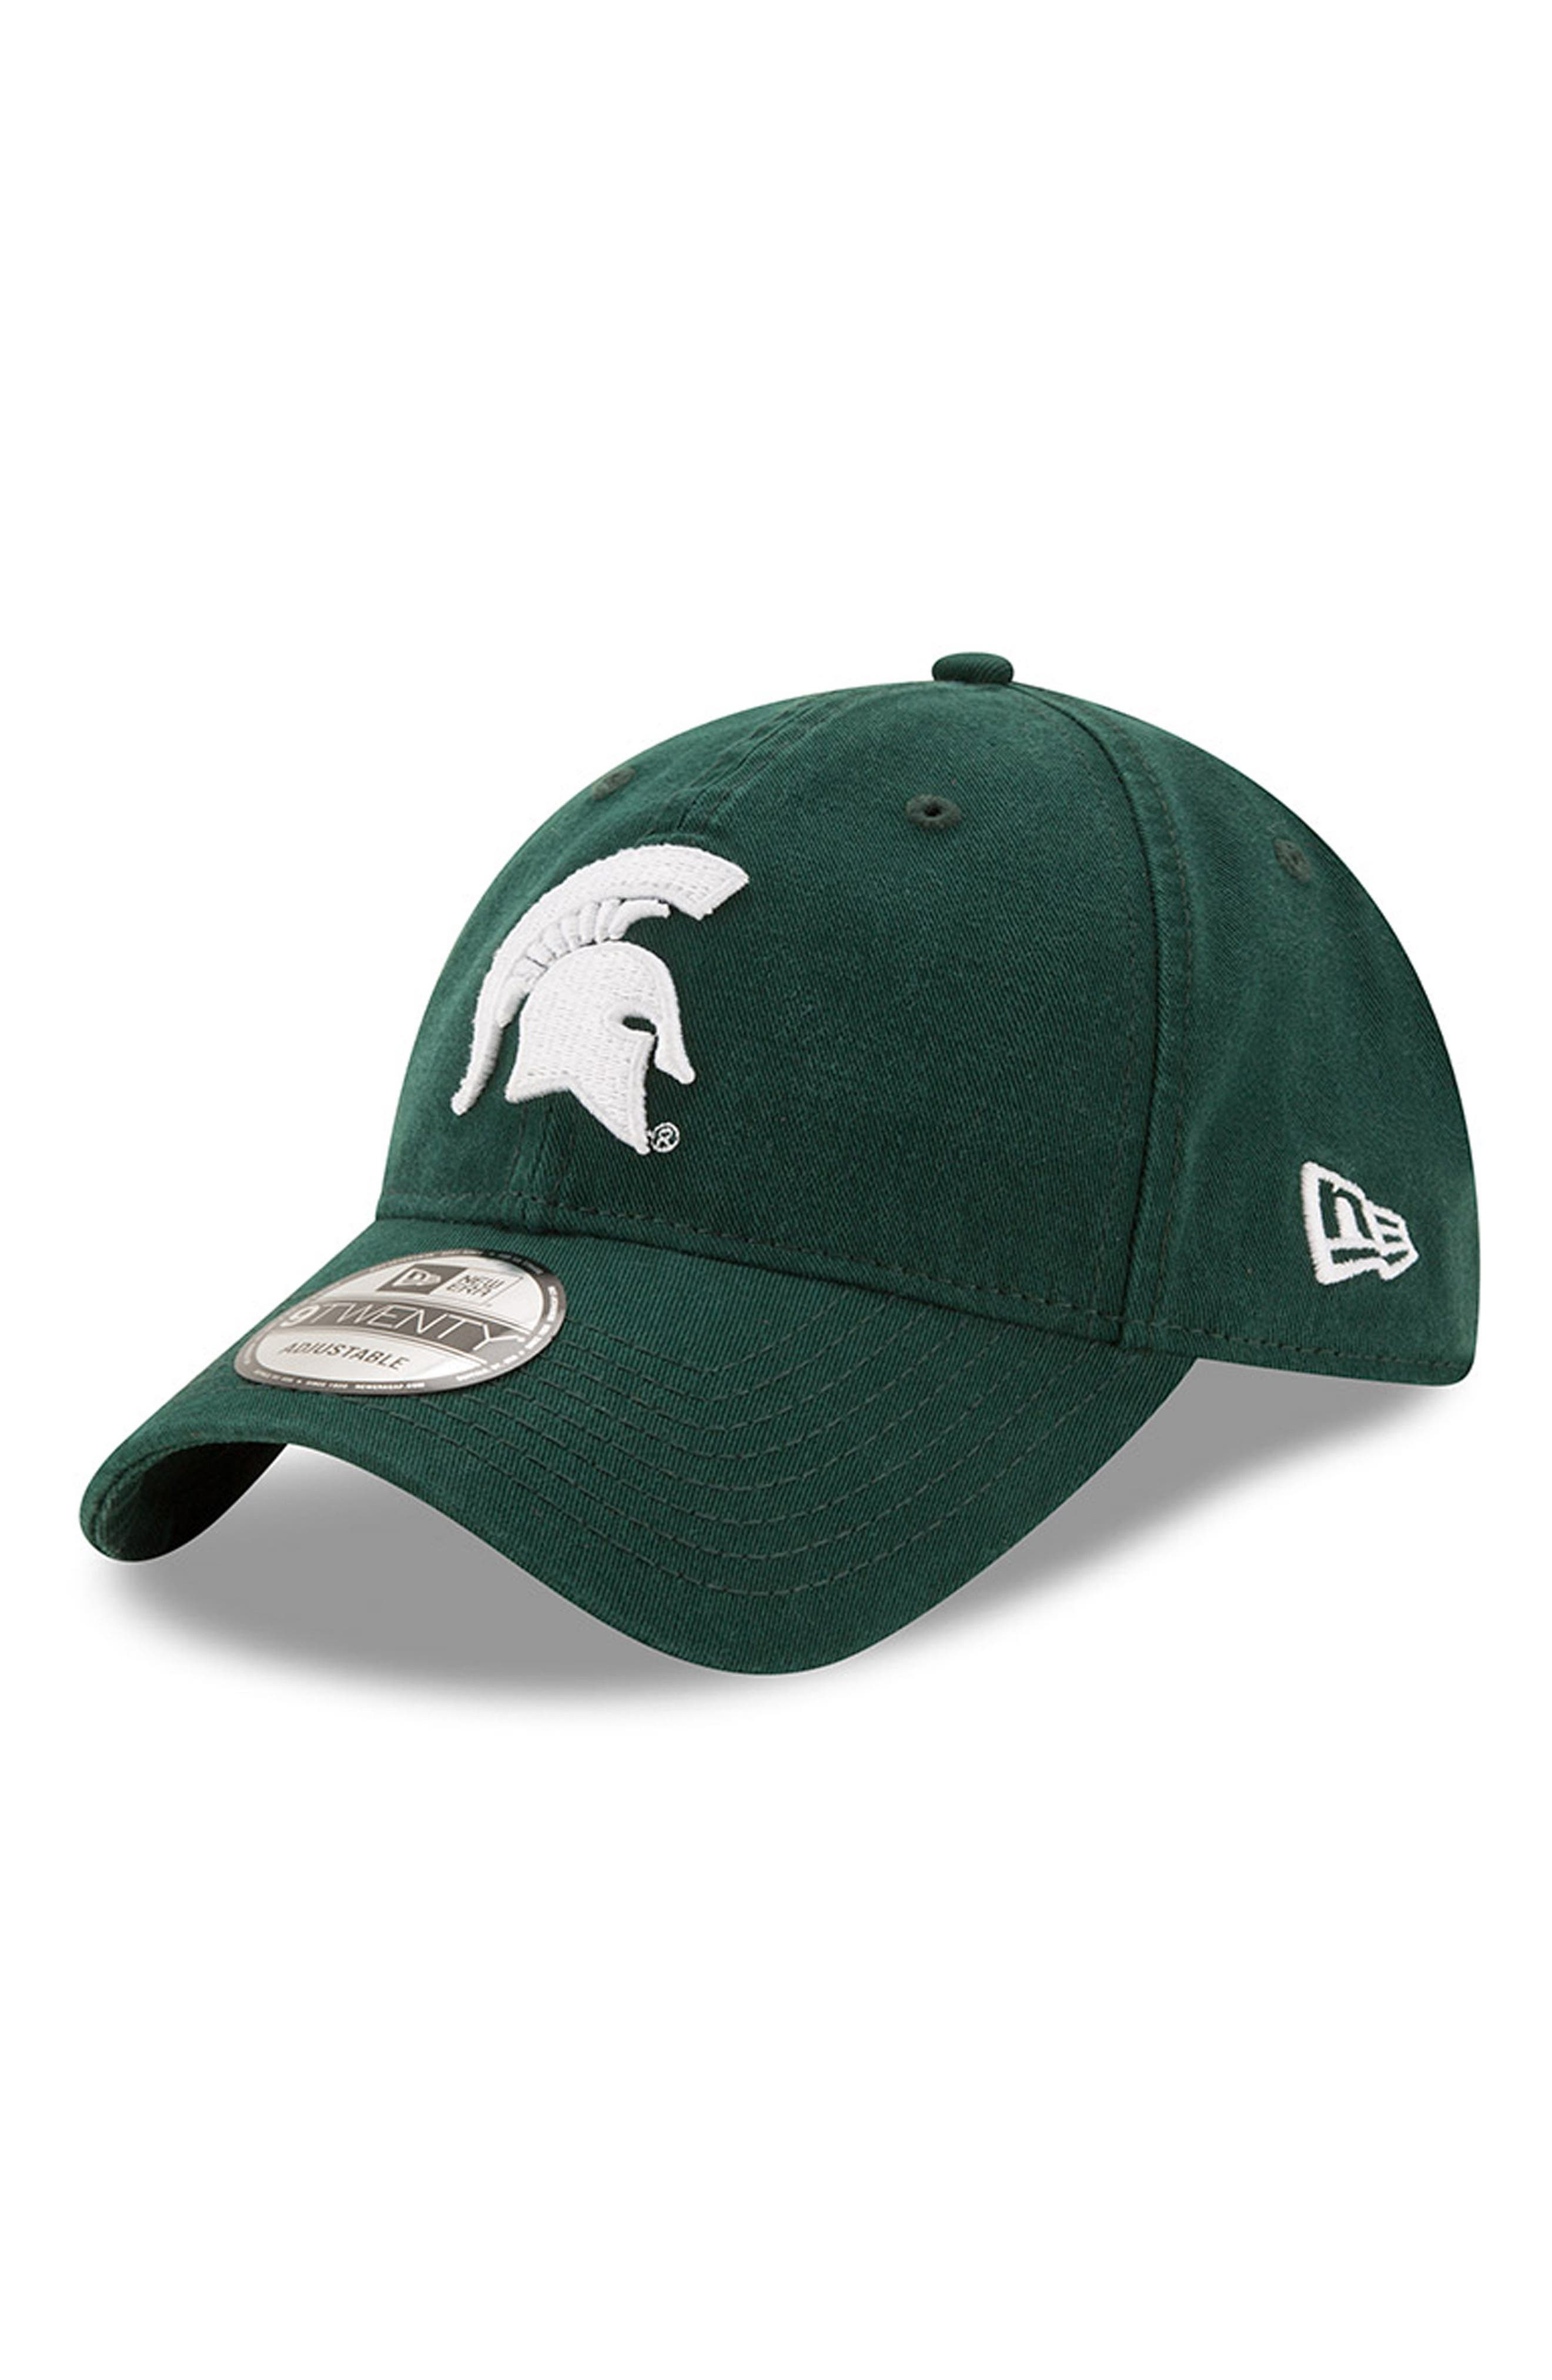 Main Image - New Era Collegiate Core Classic - Michigan State Spartans Baseball Cap